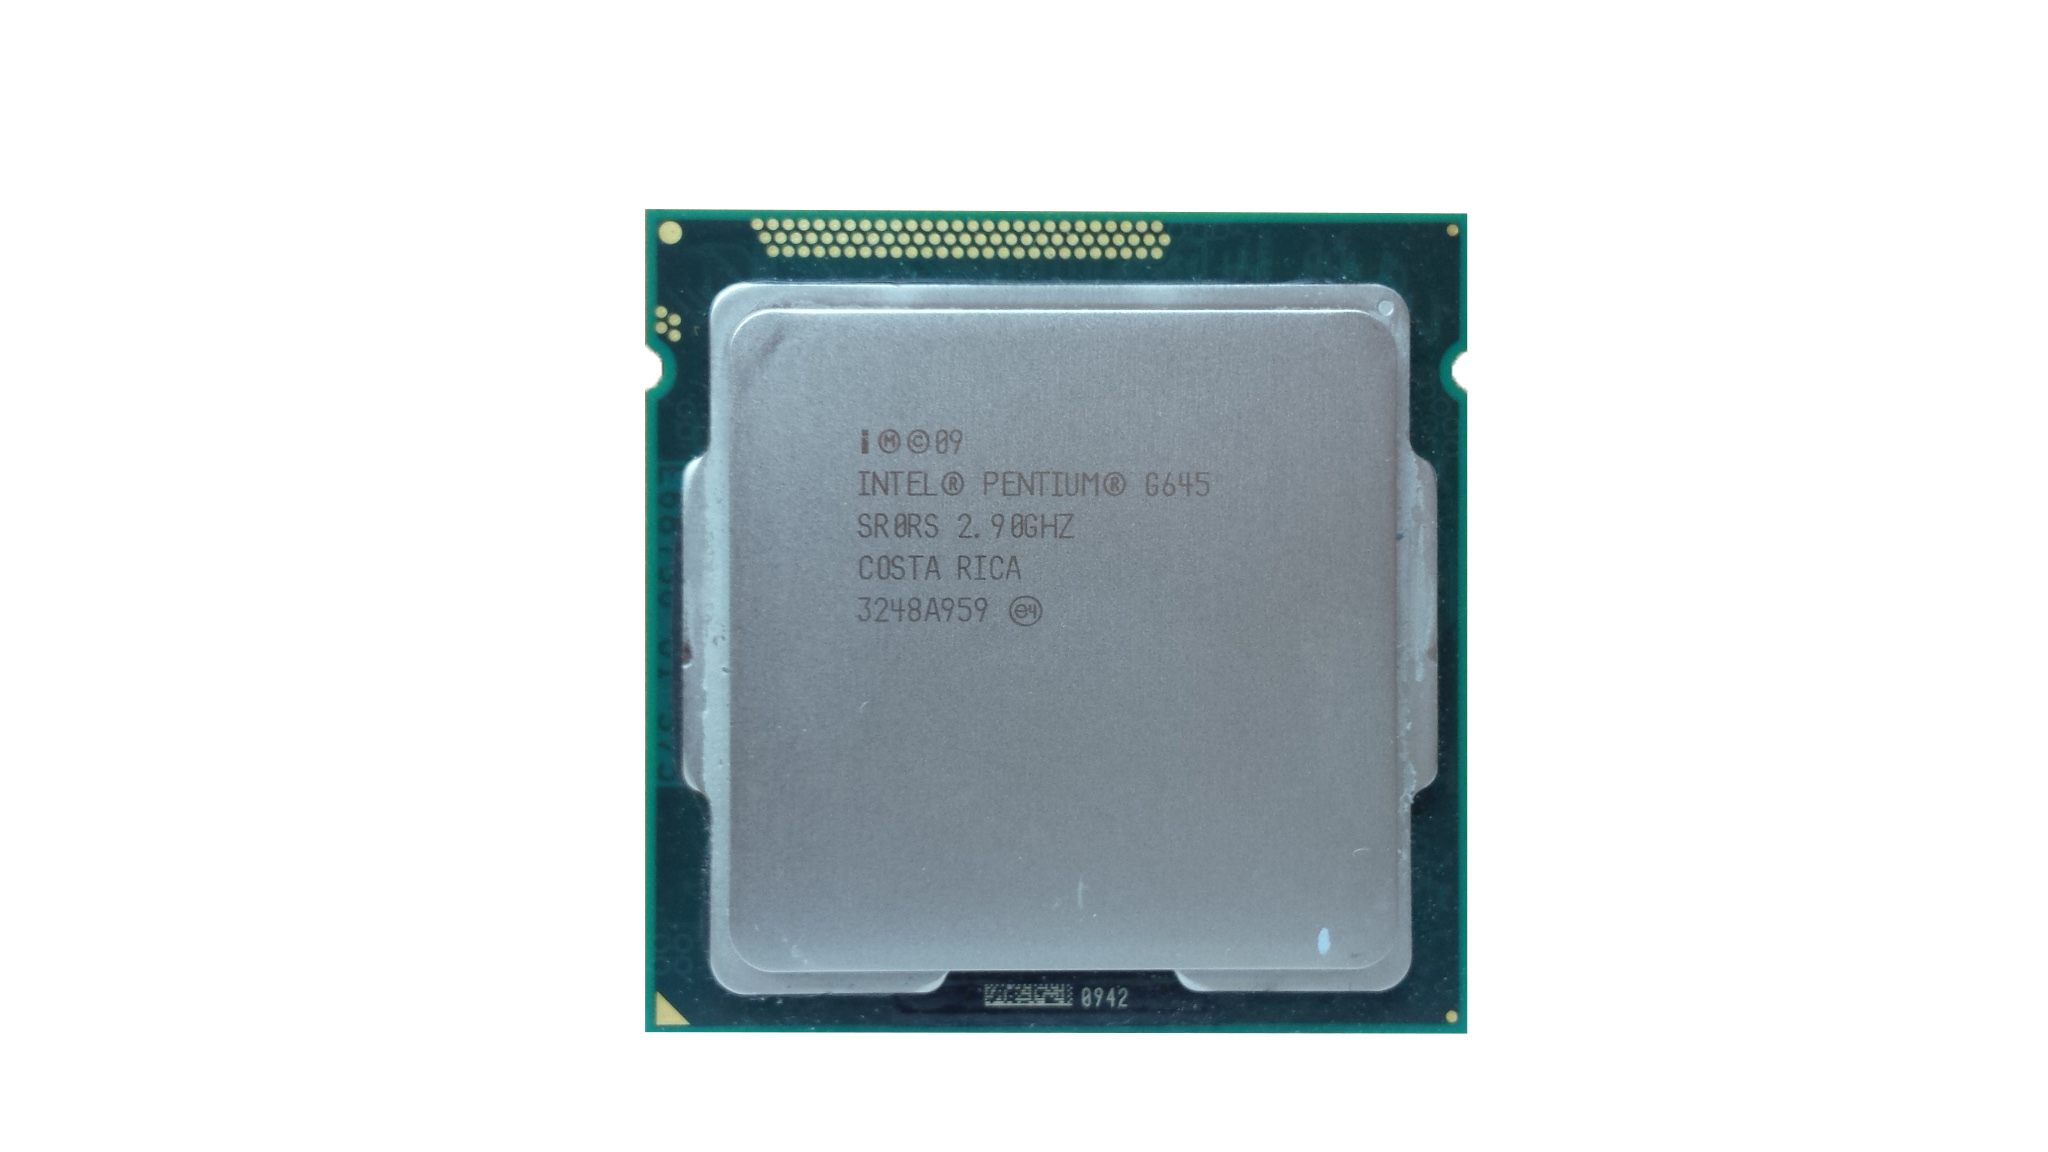 Renewed Intel Xeon E5-2609 SR0LA┬/á Quad Core 2.4GHz CPU Kit for Dell PowerEdge T620